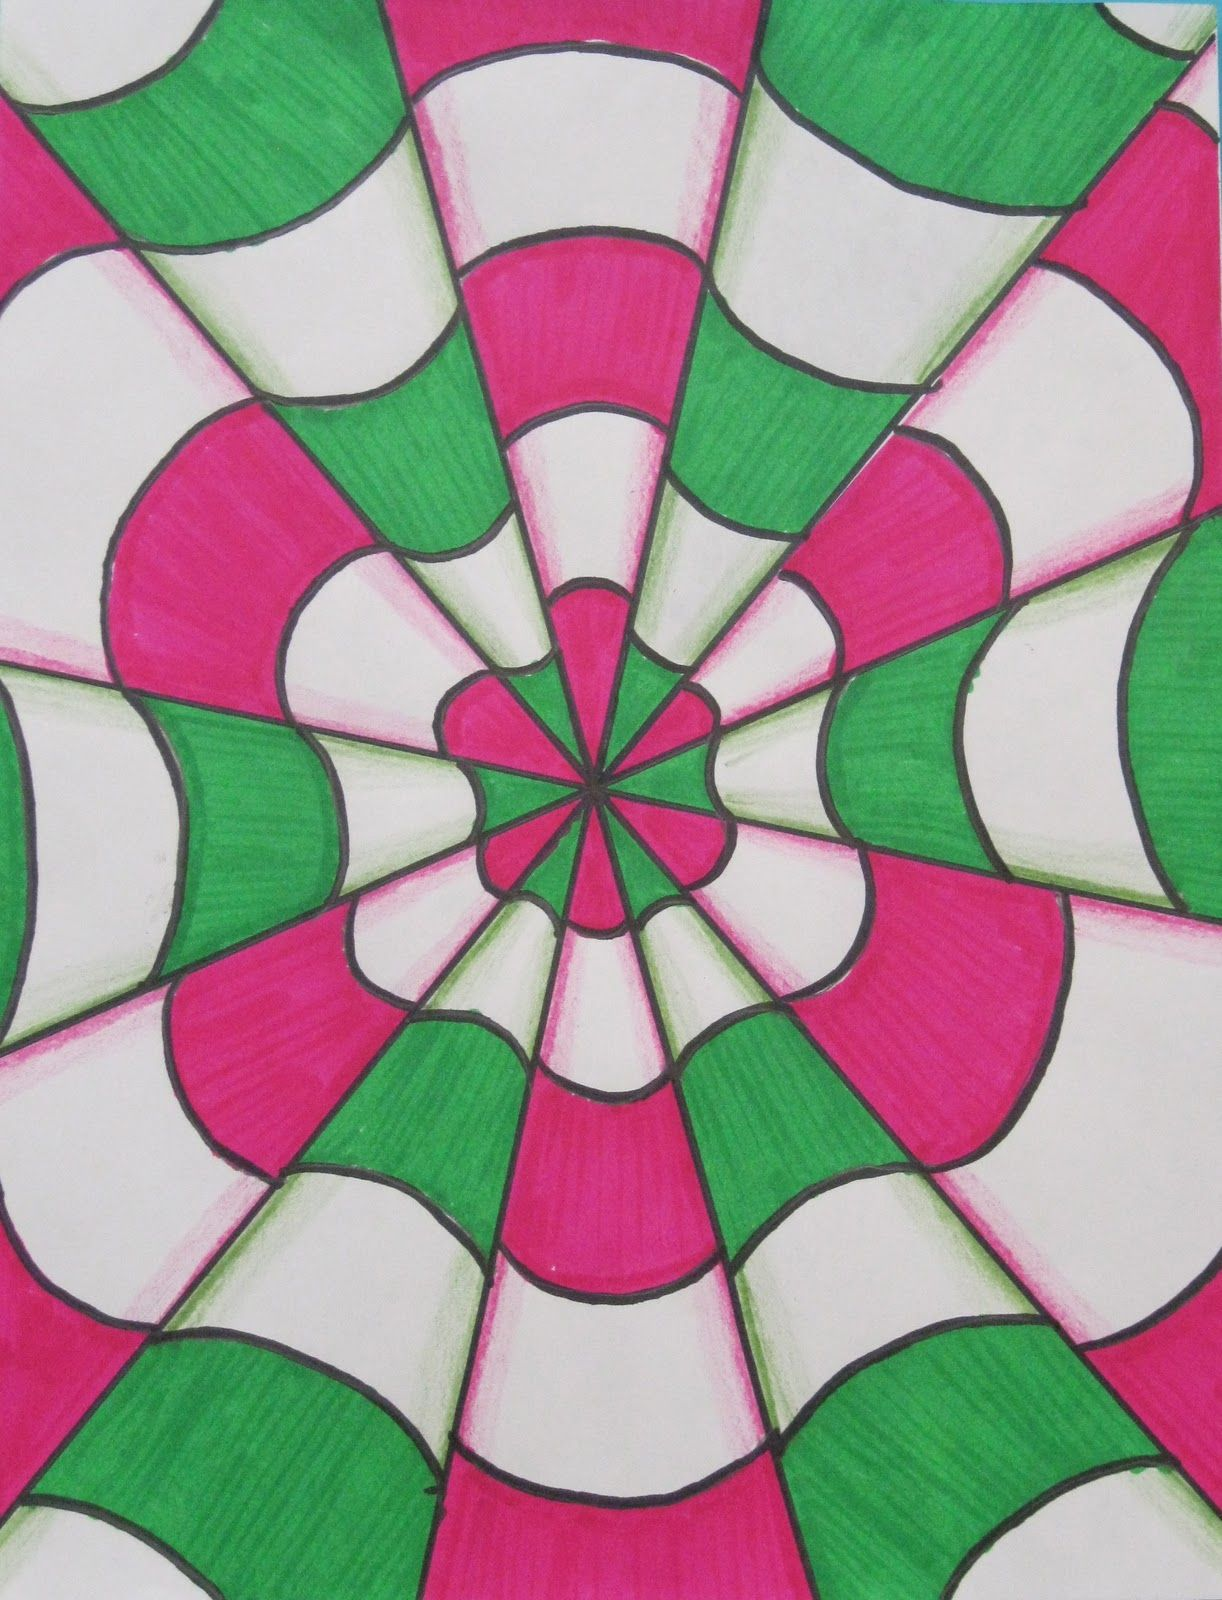 Art Ideas Part - 24: Optical Illusion Art | Rundes Room: Optical Illusions In Art Class